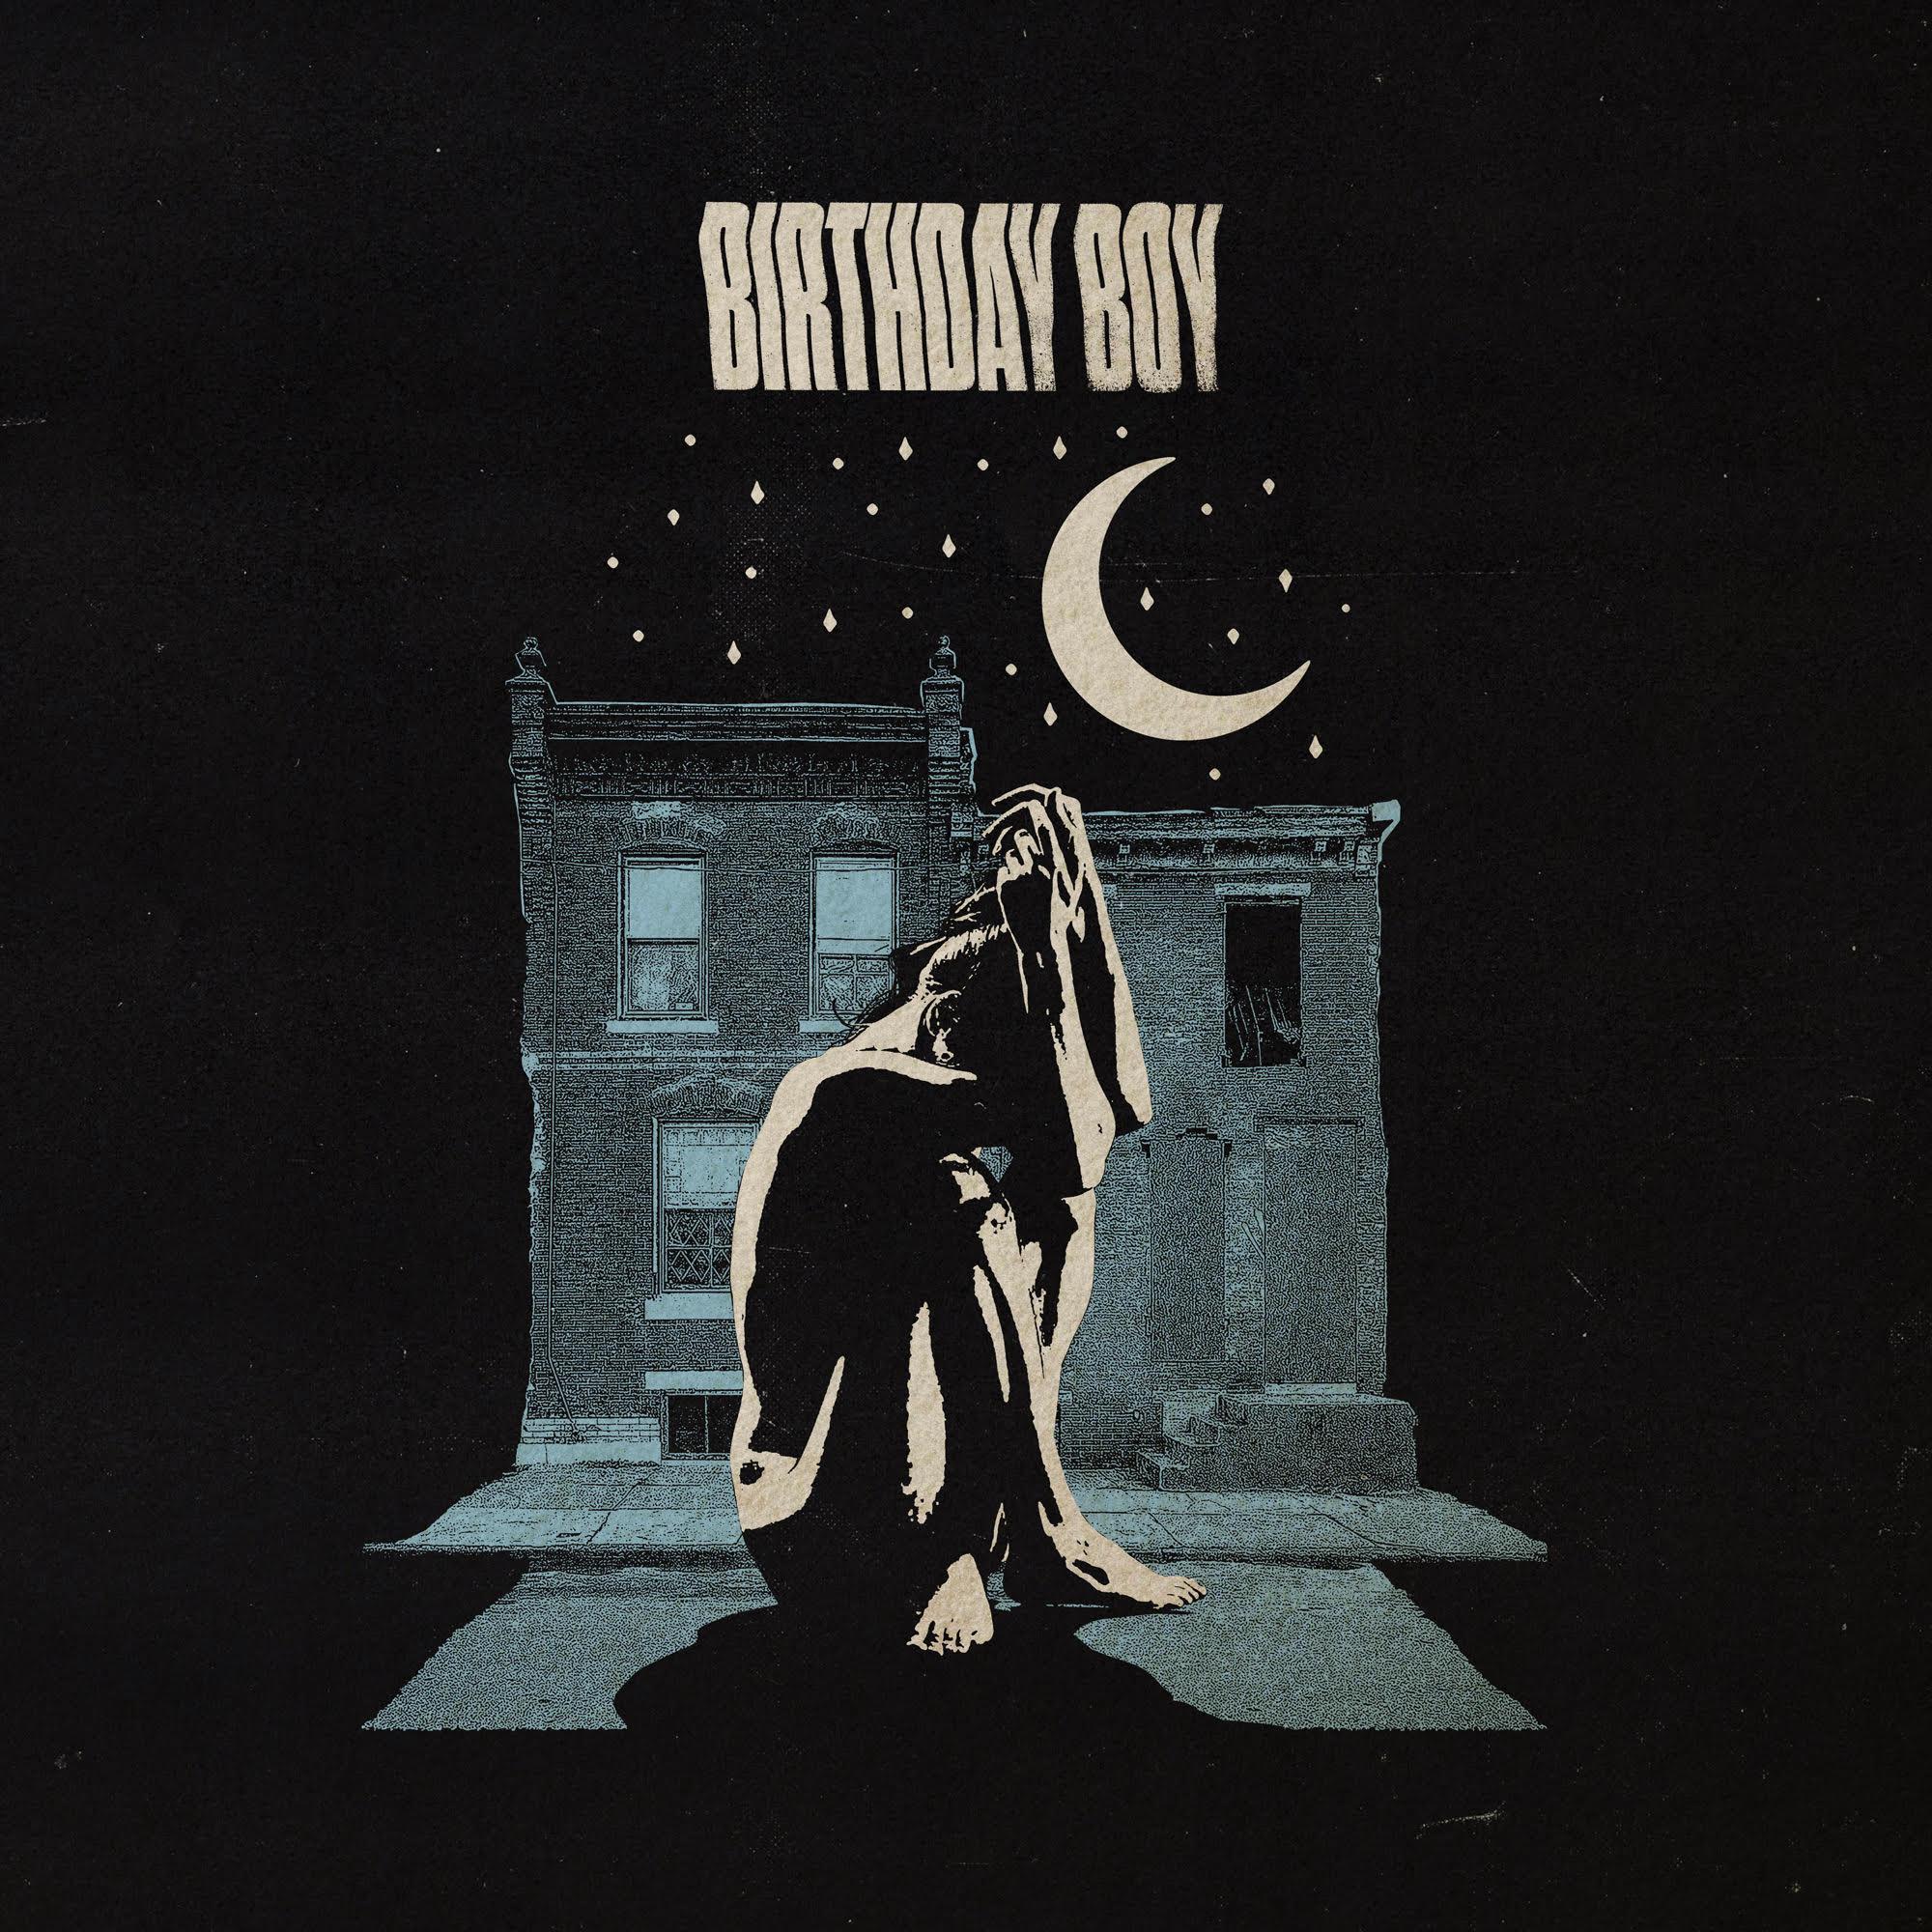 birthday boy artwork.jpg